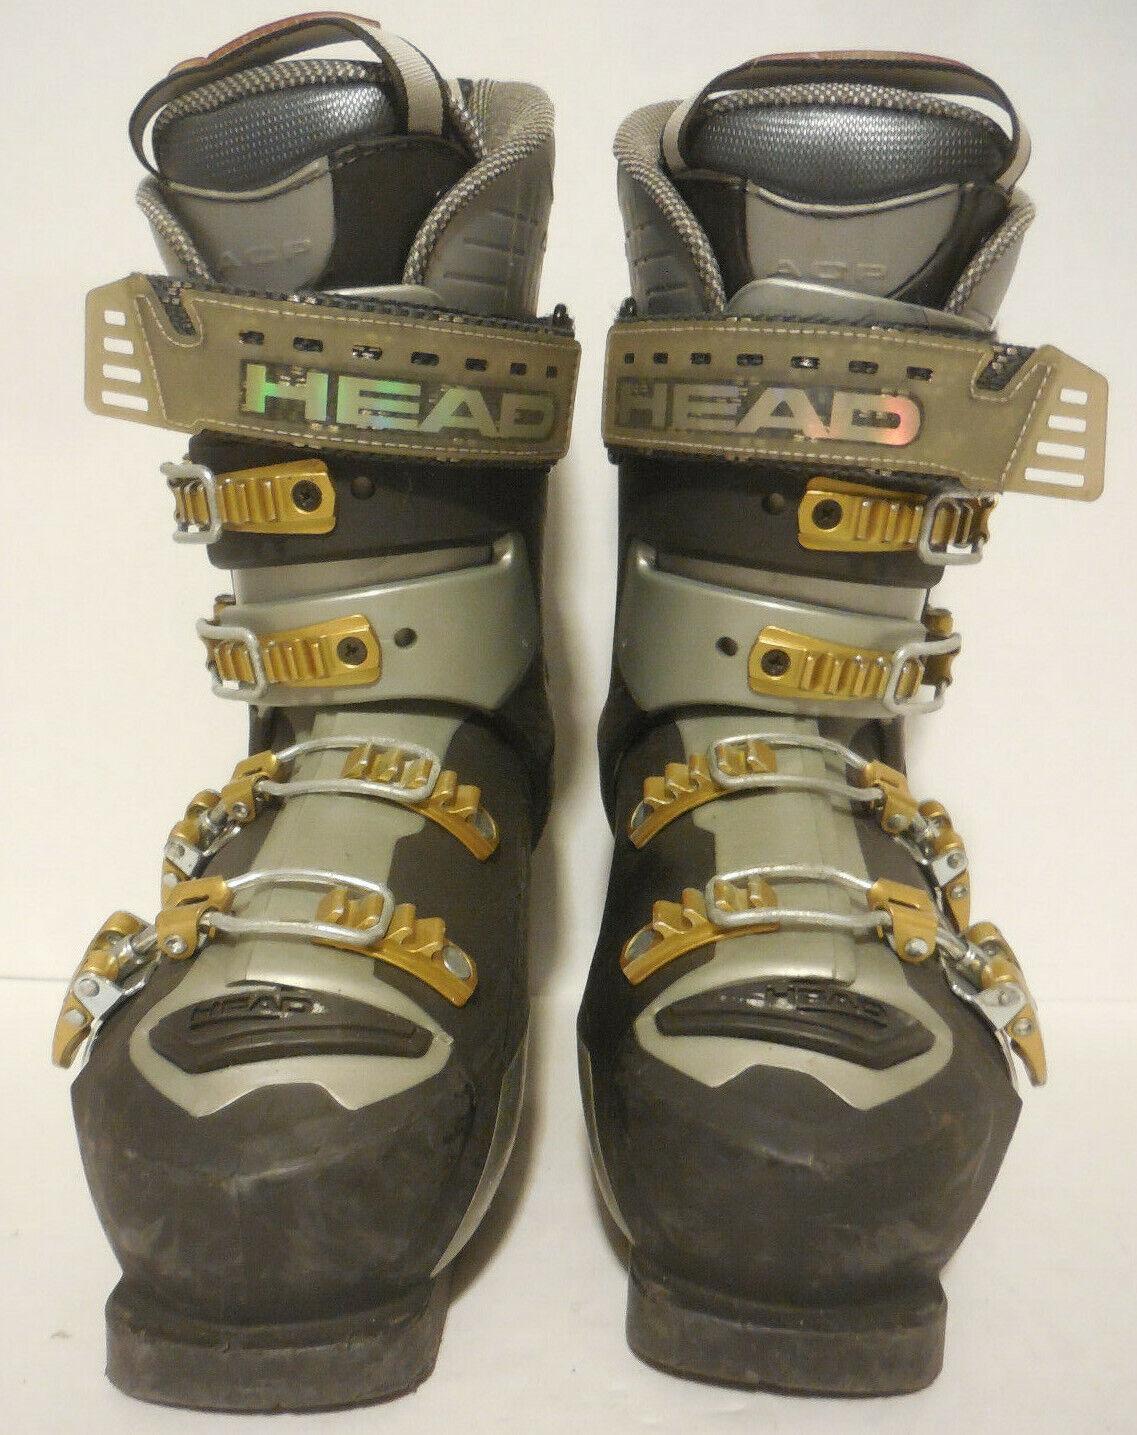 Ski Stiefel Head World Cup RS 100 Größe 25.0 damen US 8 Mens US 9